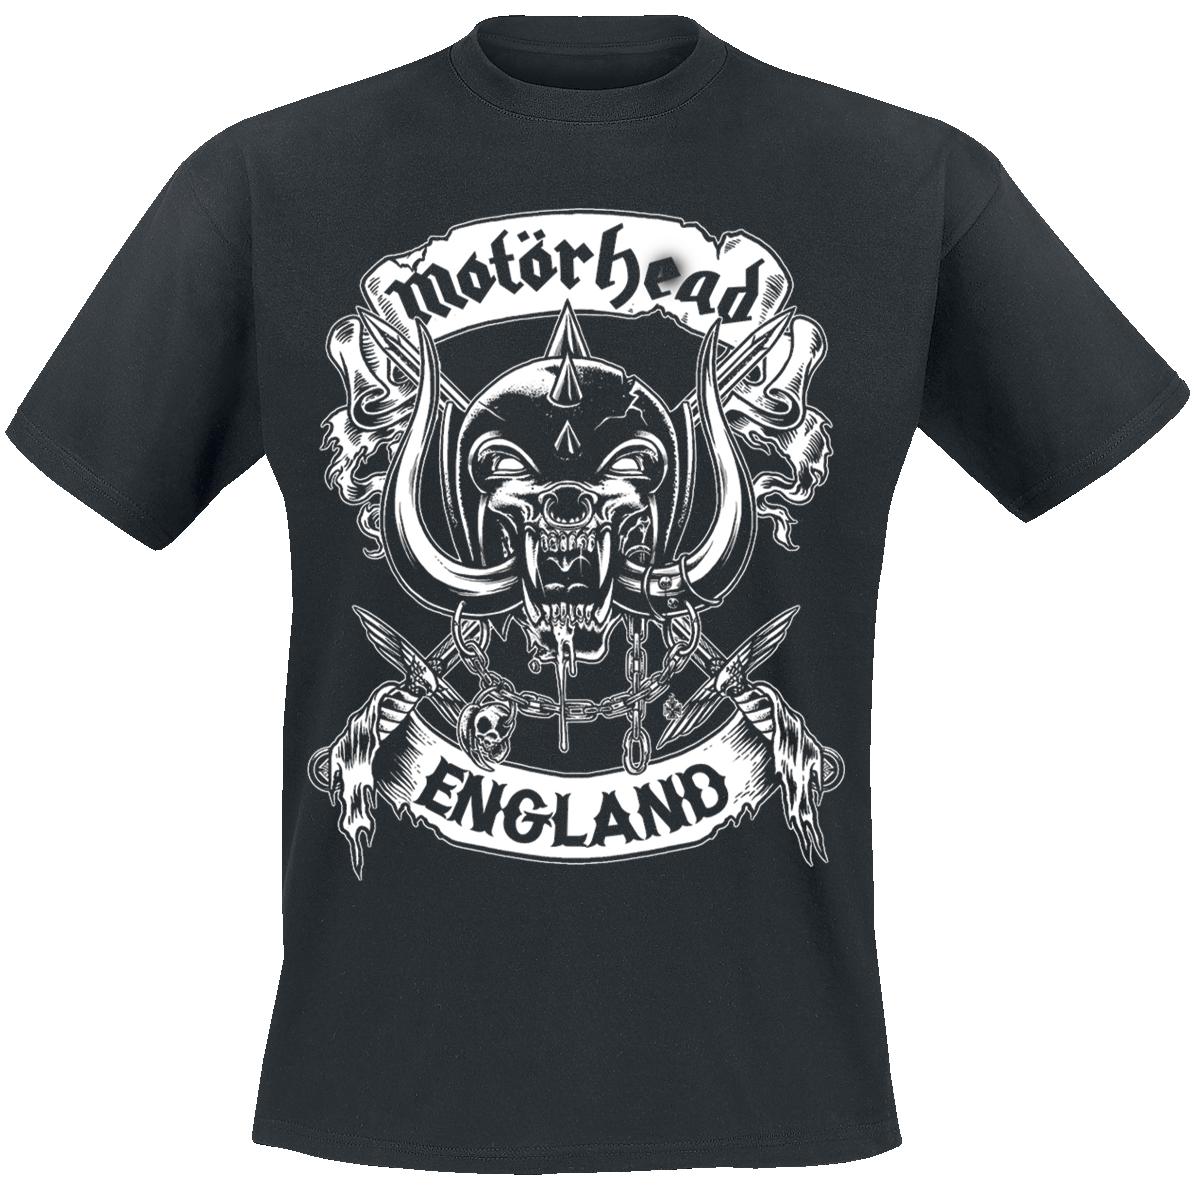 Motörhead - Crossed Sword England - T-Shirt - black image